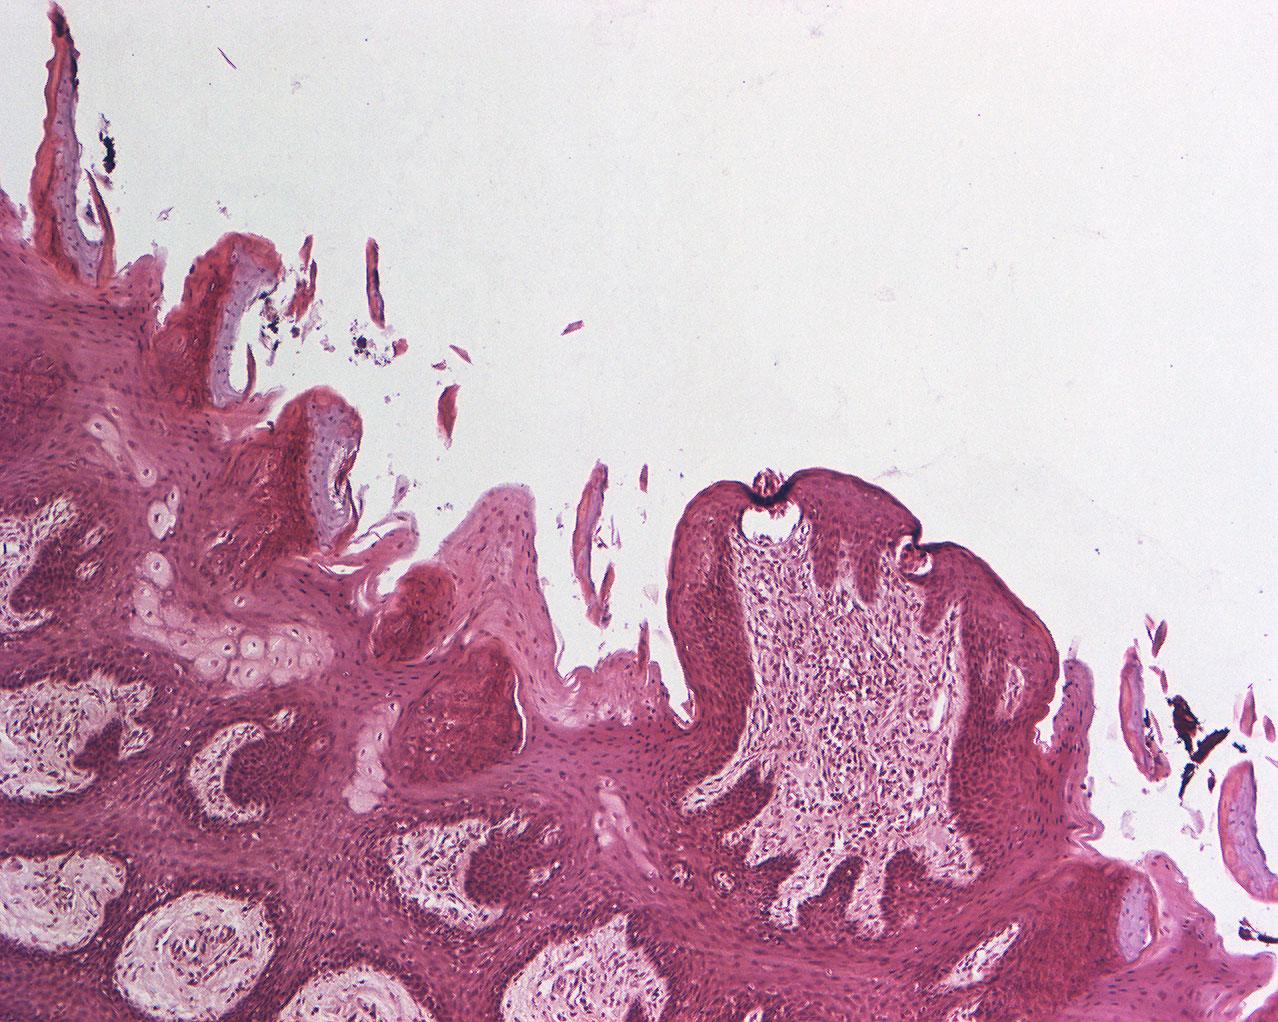 Filiform And Fungiform Papillae Of The Tongue 100 X Anatomicum